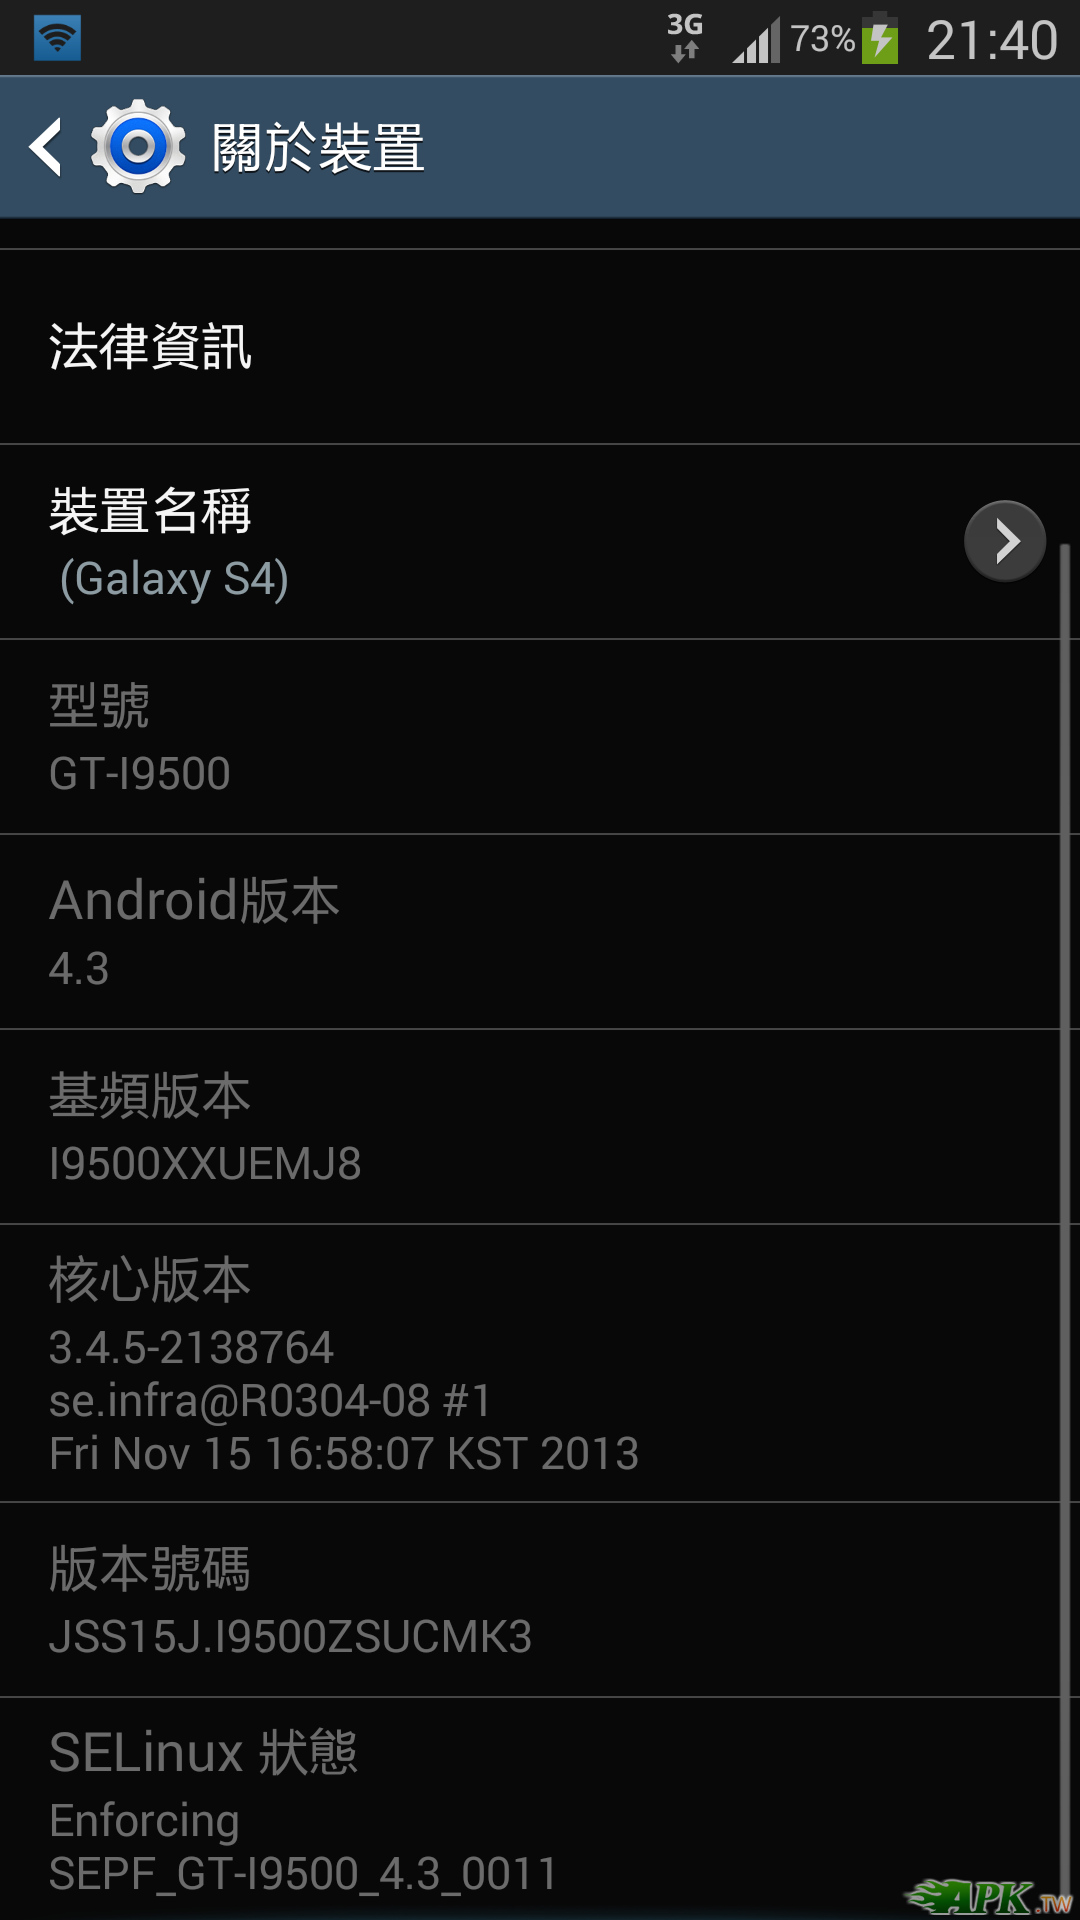 Screenshot_2014-01-06-21-40-14.png